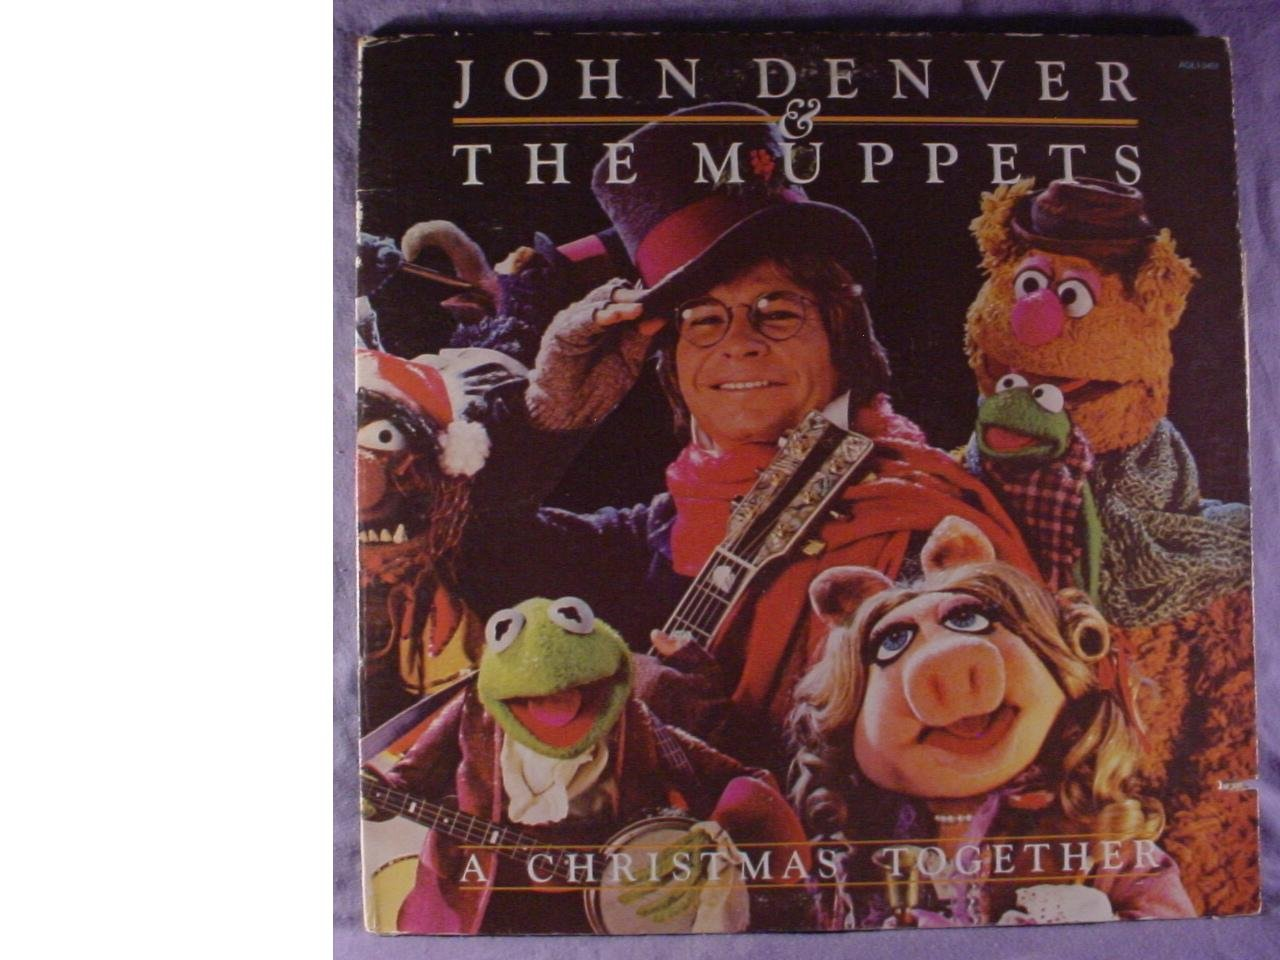 John Denver & The Muppets - A Christmas Together - Amazon.com Music